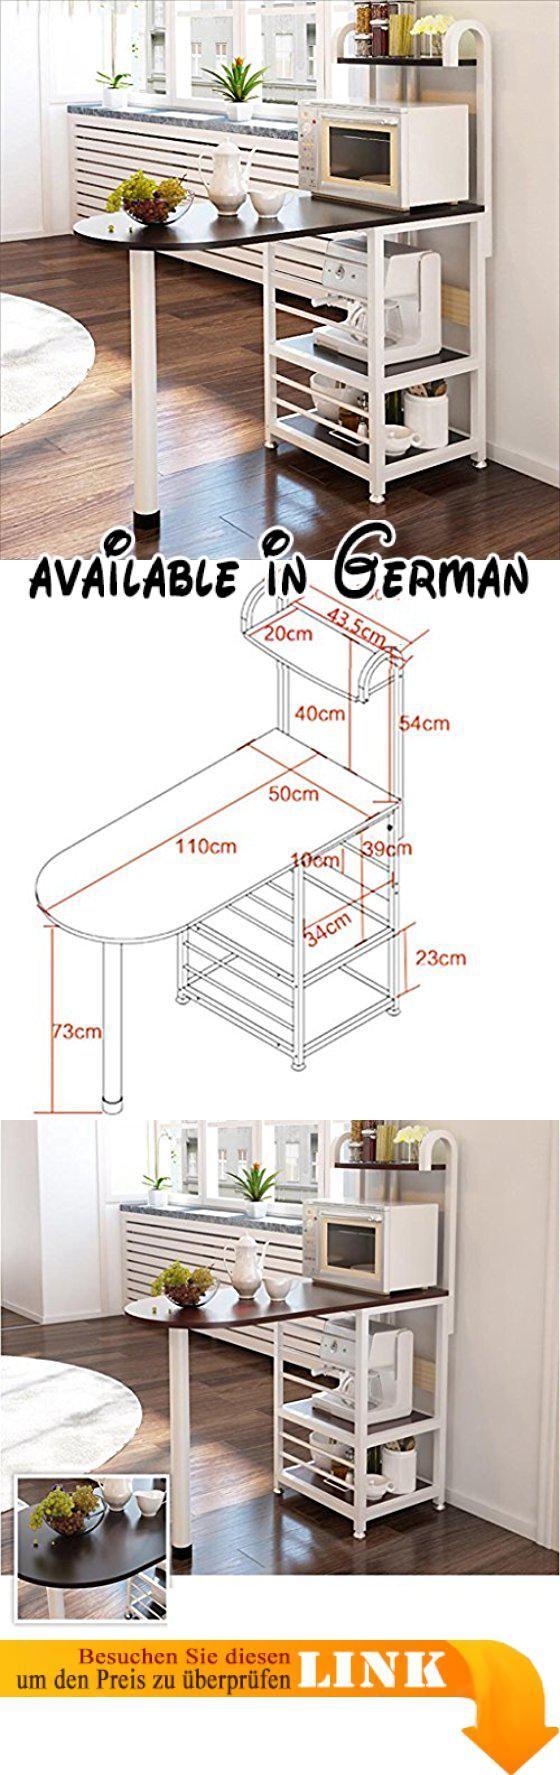 B078WR2T4V : L&Y Kitchen furniture Kreative Küche Regal ...